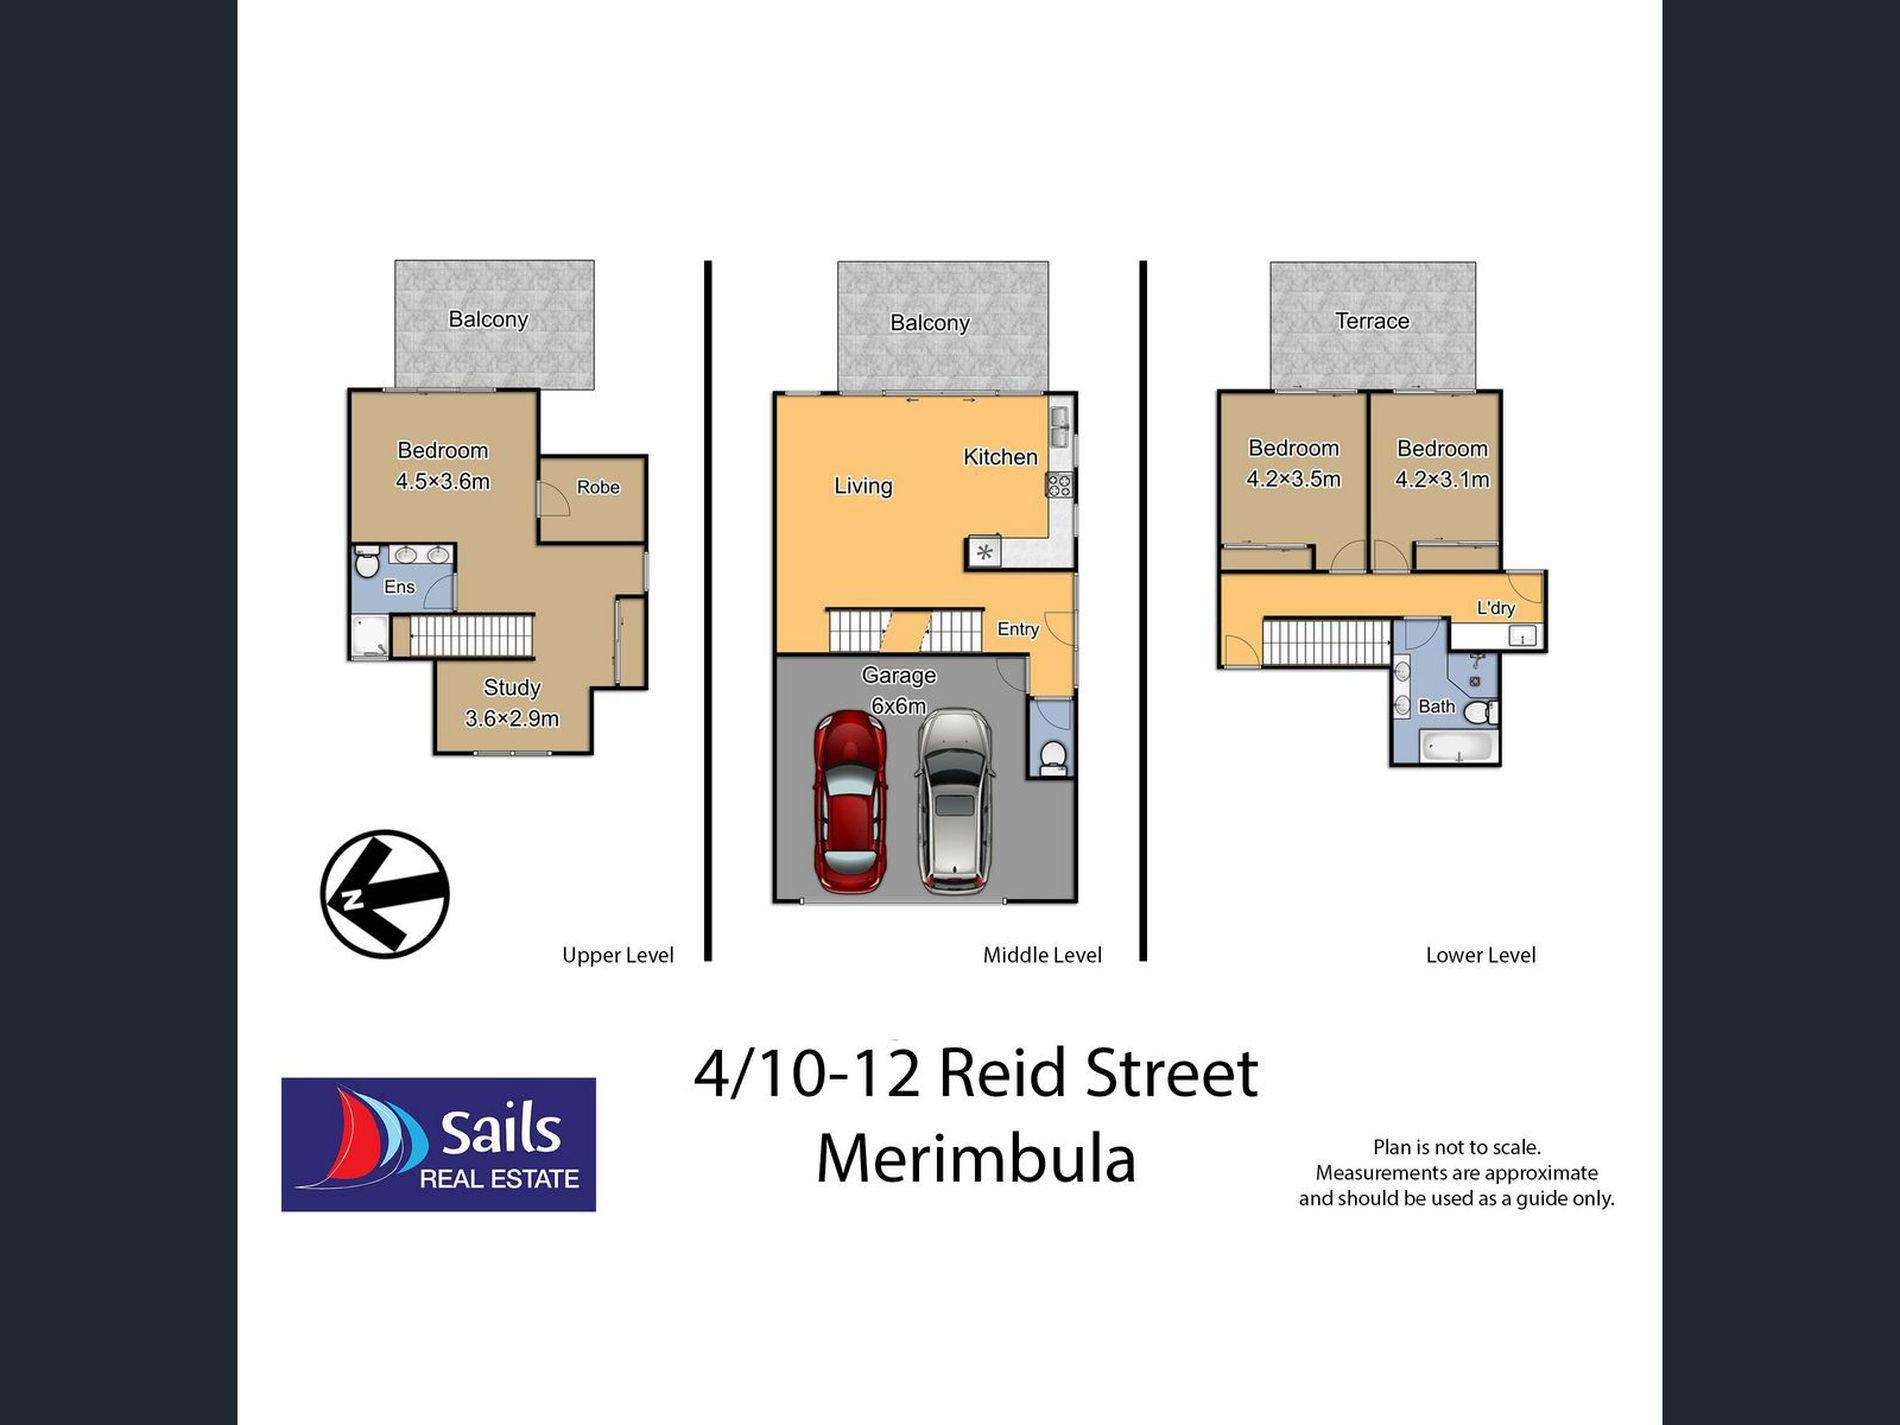 4 / 10 Reid Street, Merimbula